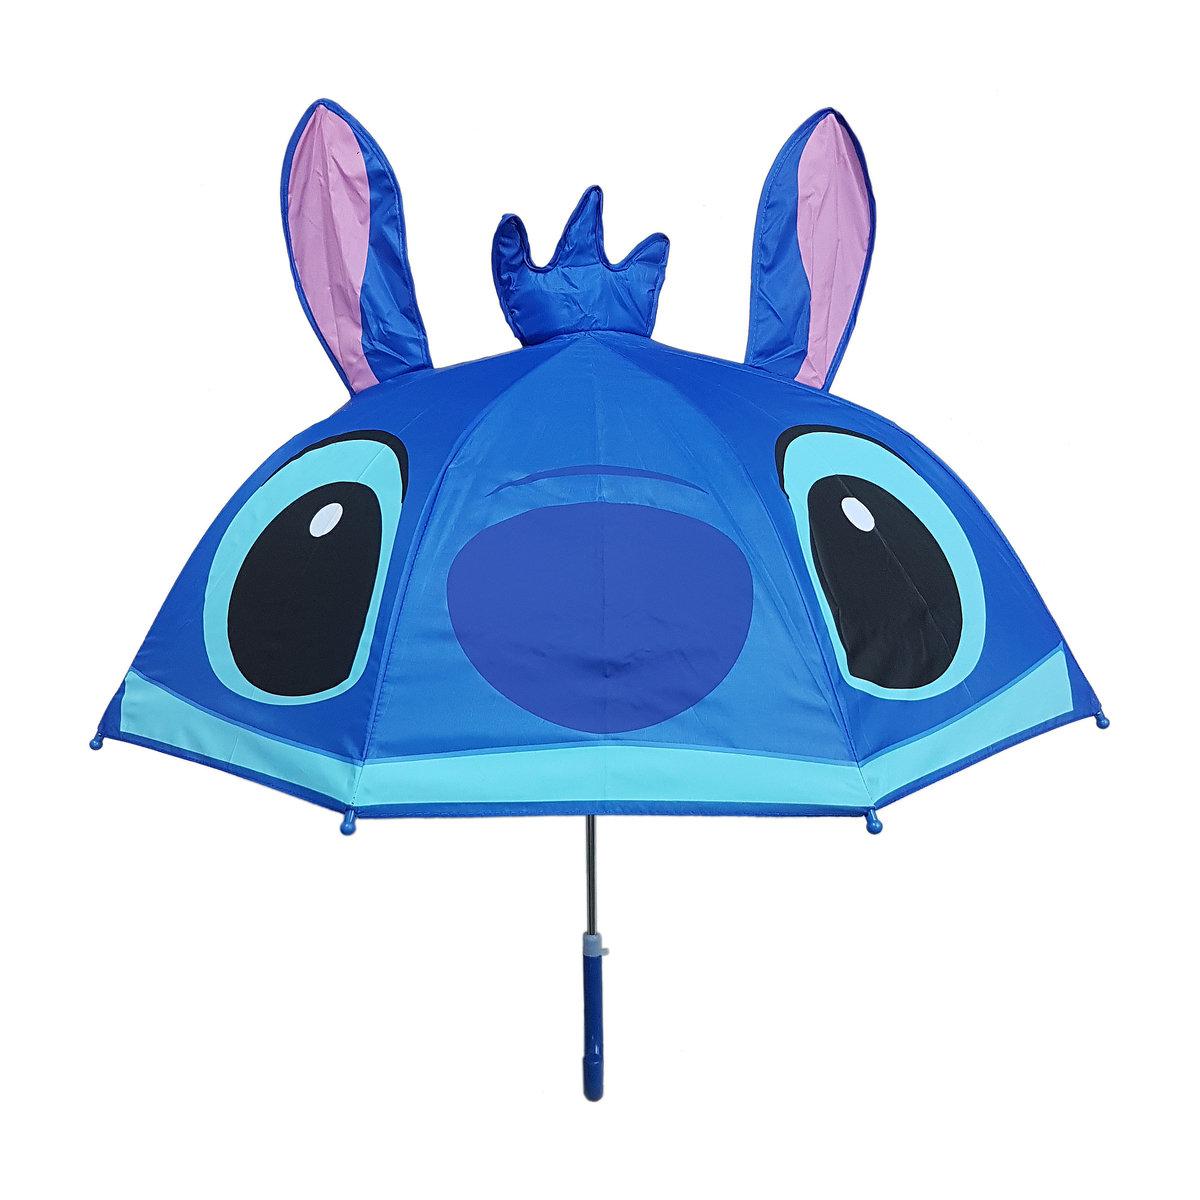 Disney - Disney - 3D umbrella (Stitch) (Licensed by Disney)